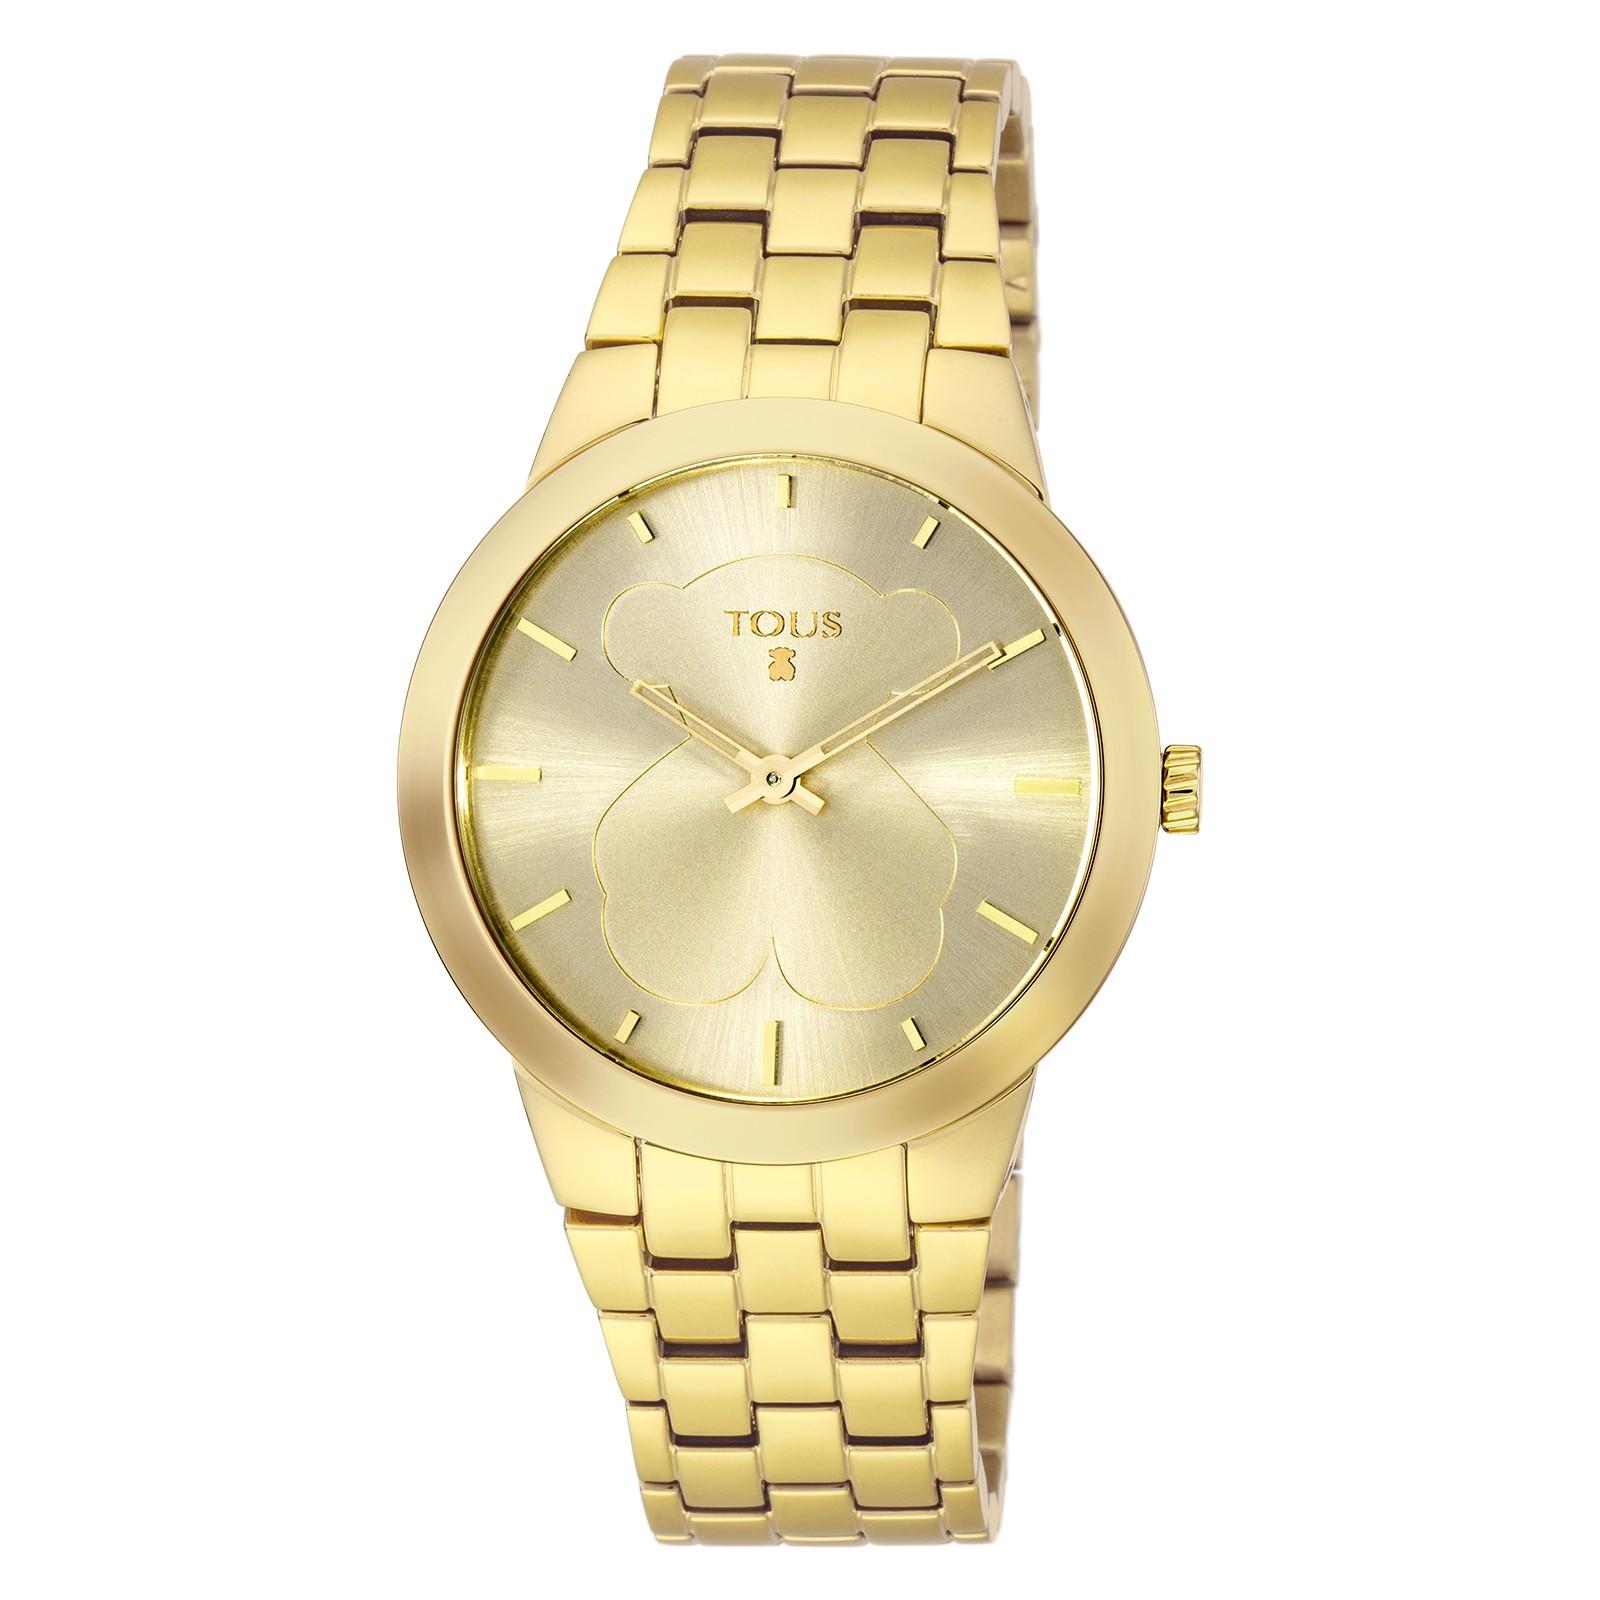 ecfa23325f31 Reloj TOUS B-Face dorado de acero